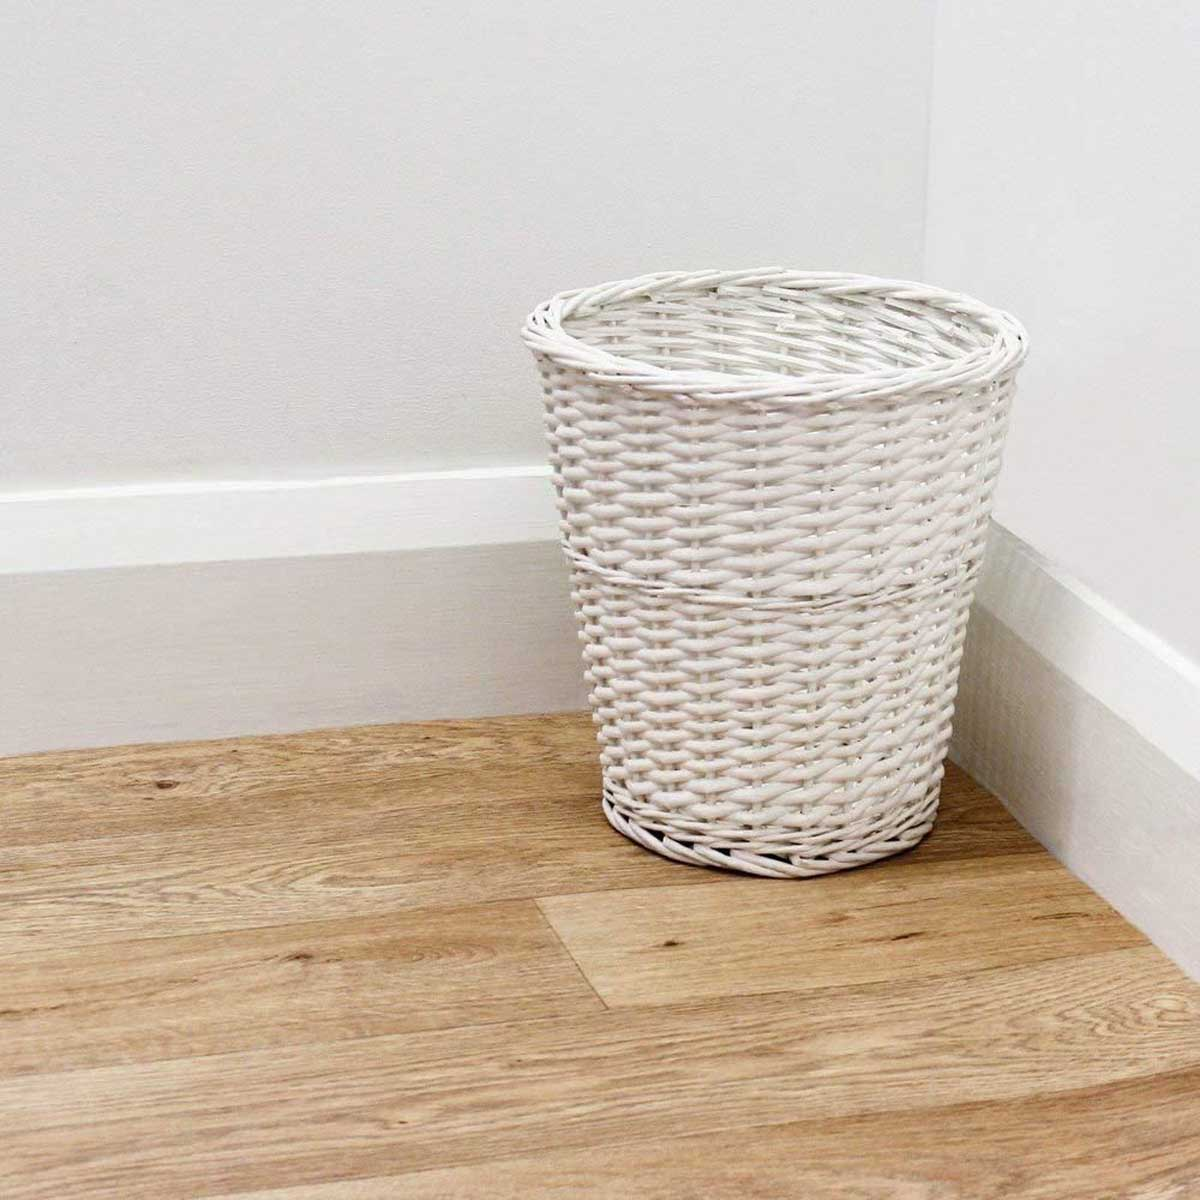 Circular Willow Wicker Waste Paper Basket Bin